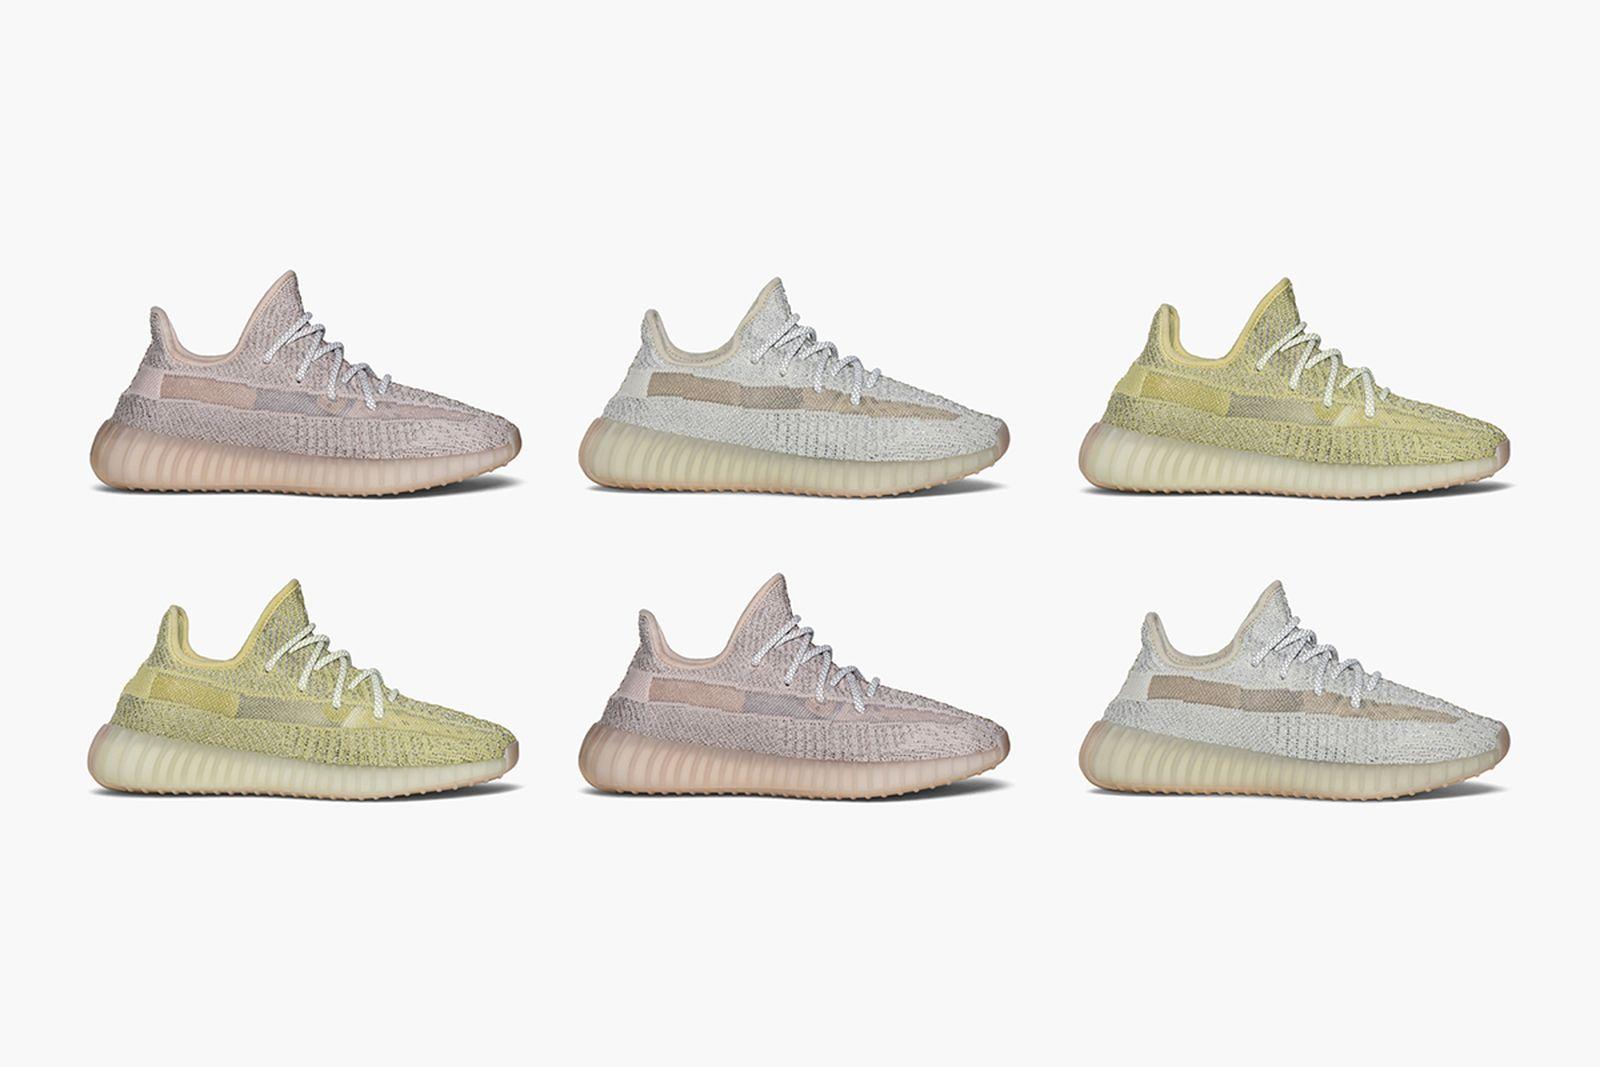 adidas yeezy releases